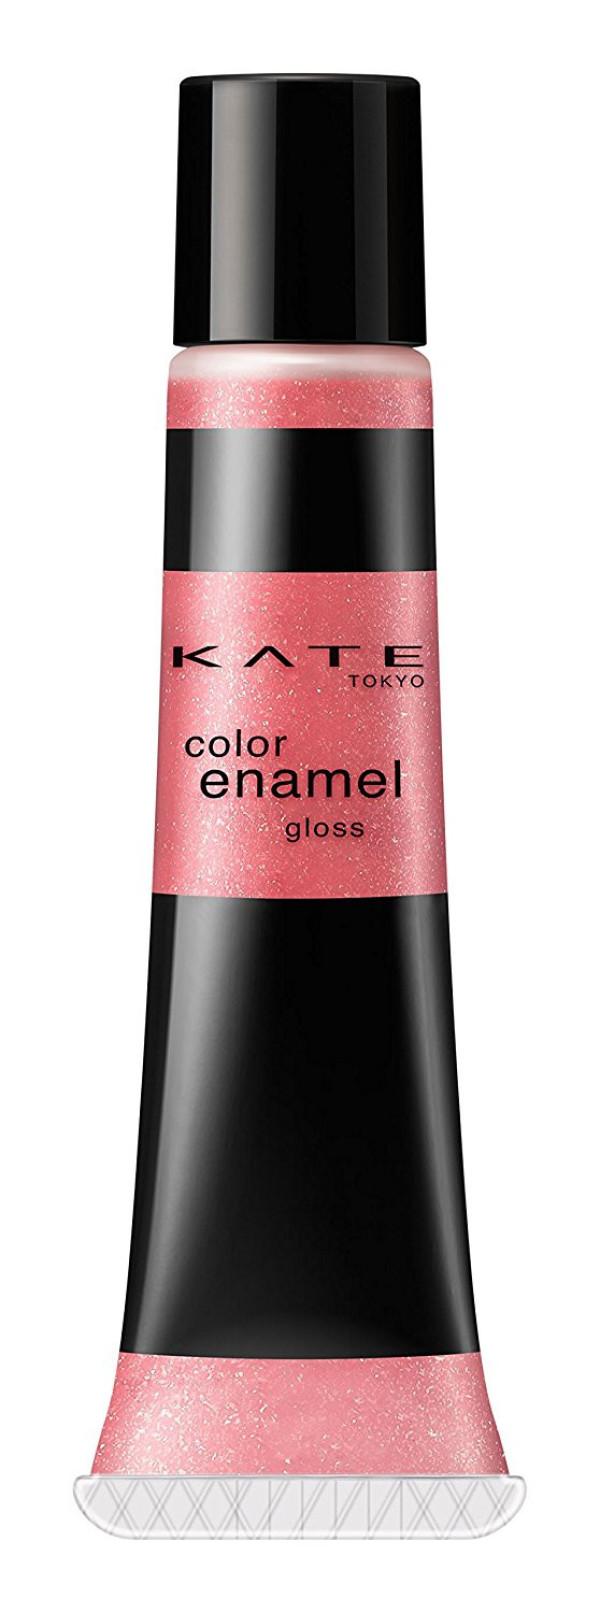 Блеск для губ Kanebo Kate Lip Gloss Color Enamel Gloss